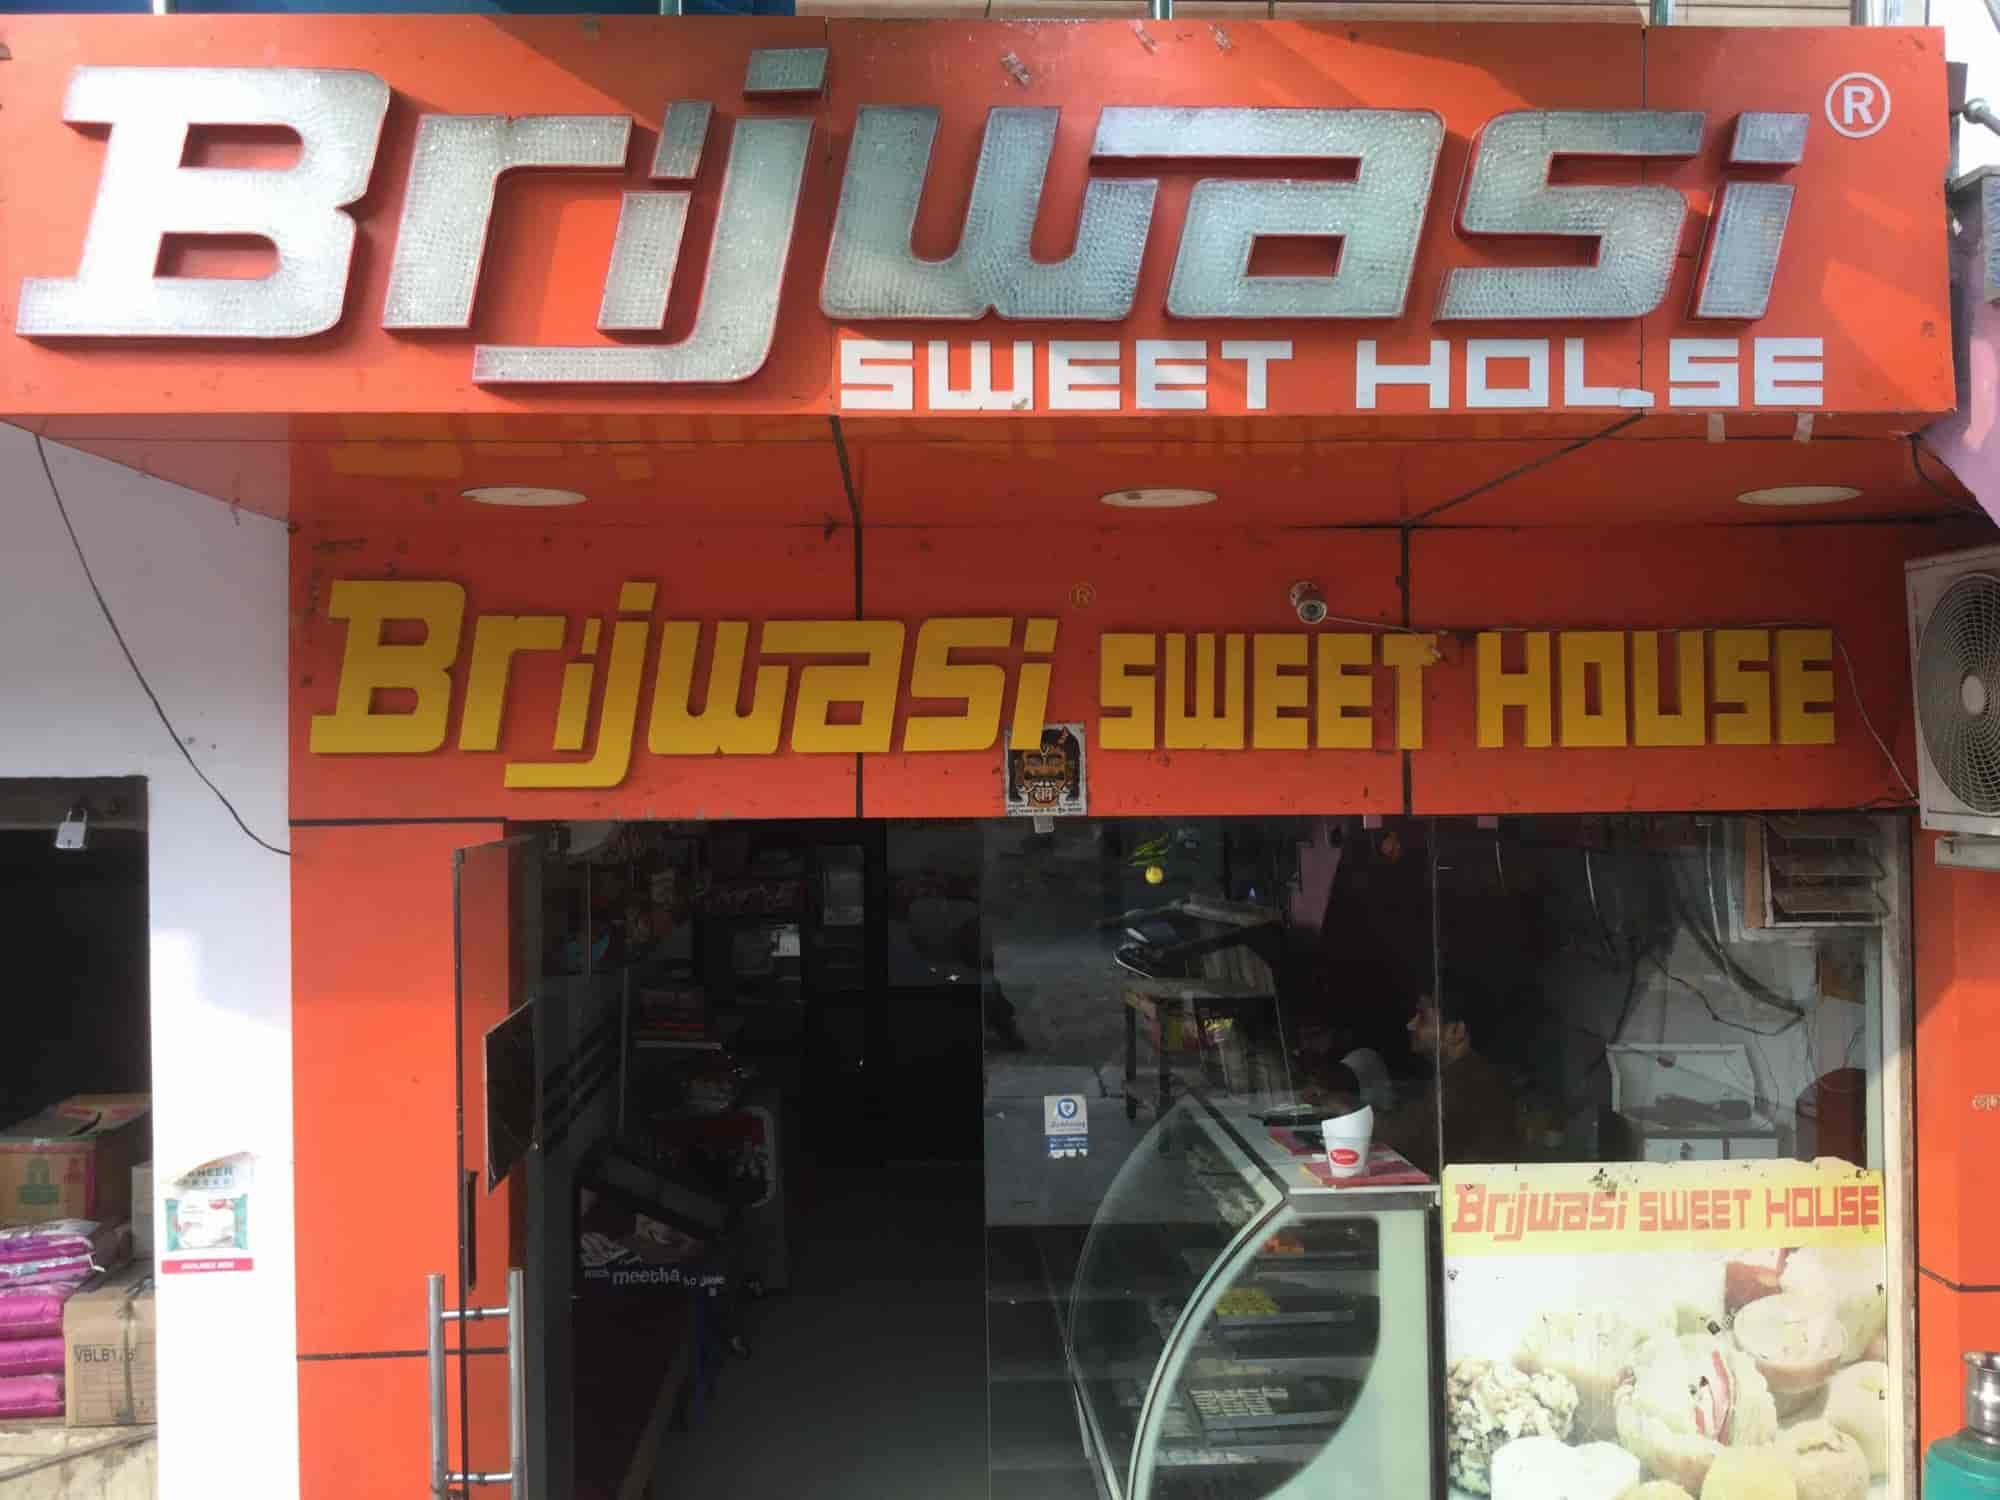 Brijwasi Sweet House, Lohamandi, Agra - Desserts, Pure Vegetarian ...